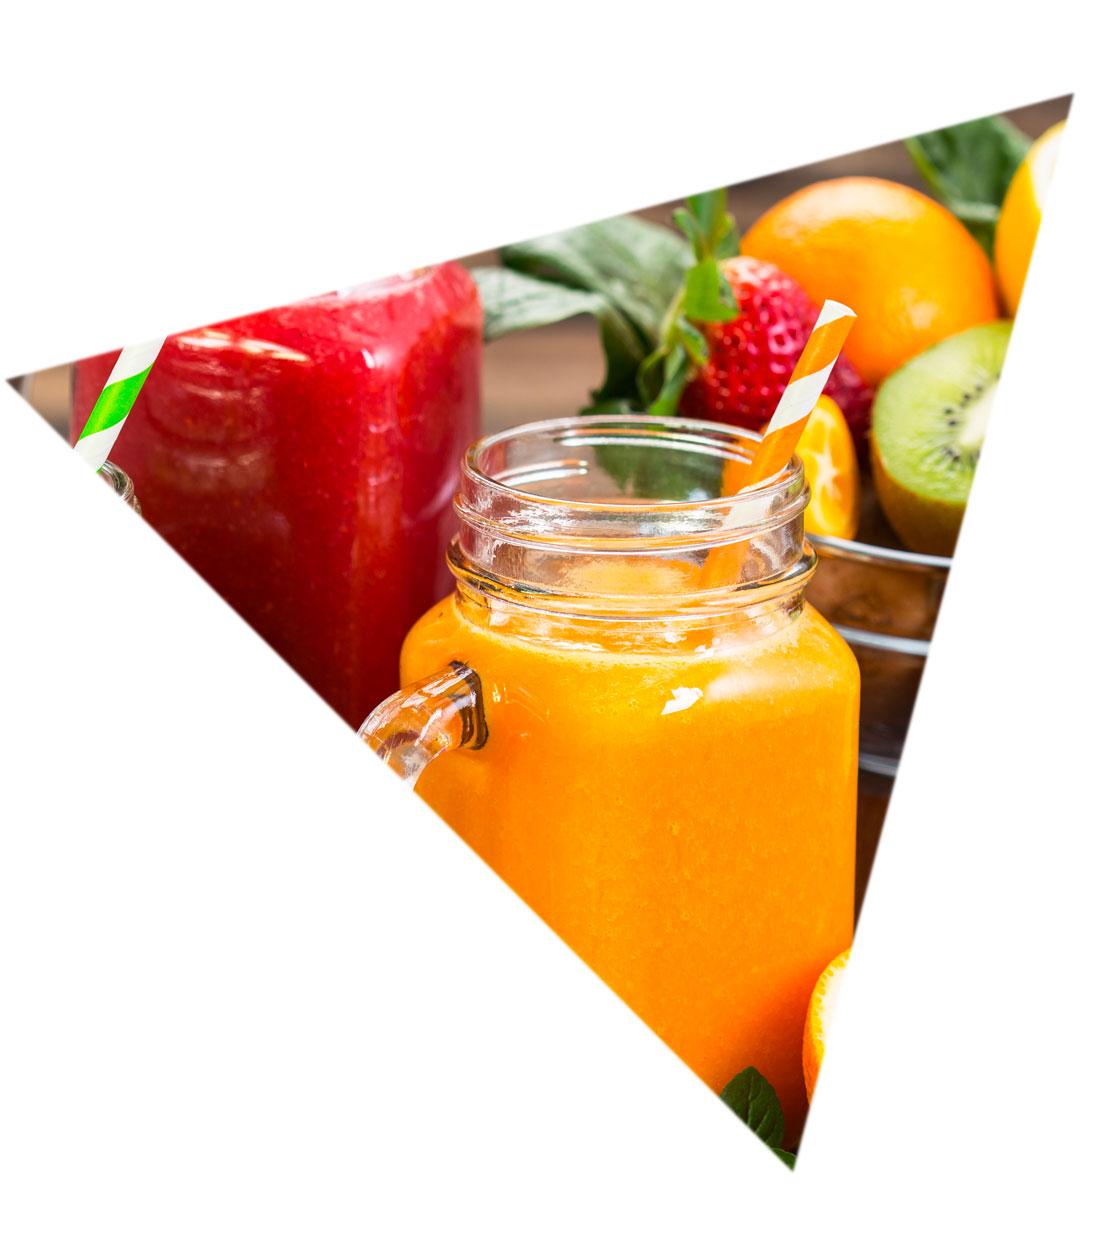 https://www.bertoli-homogenizers.com/wp-content/uploads/2020/01/alimentare.jpg